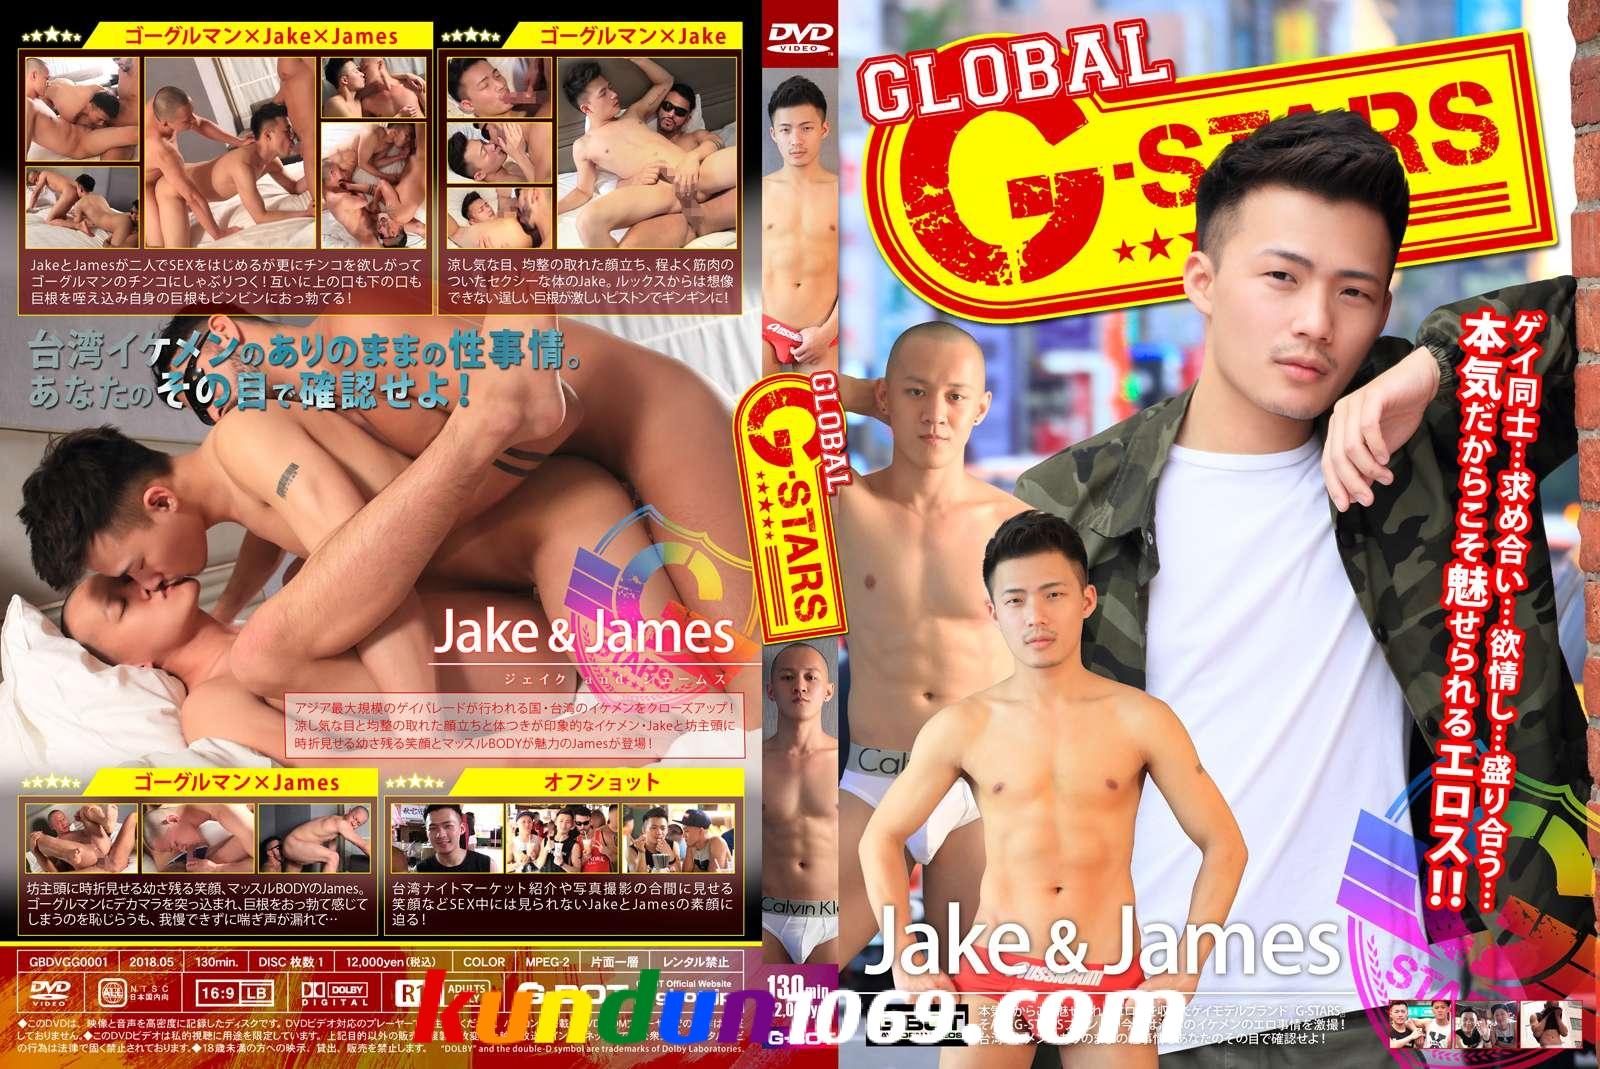 [G-BOT] GLOBAL G-STARS JAKE & JAMES フルセット